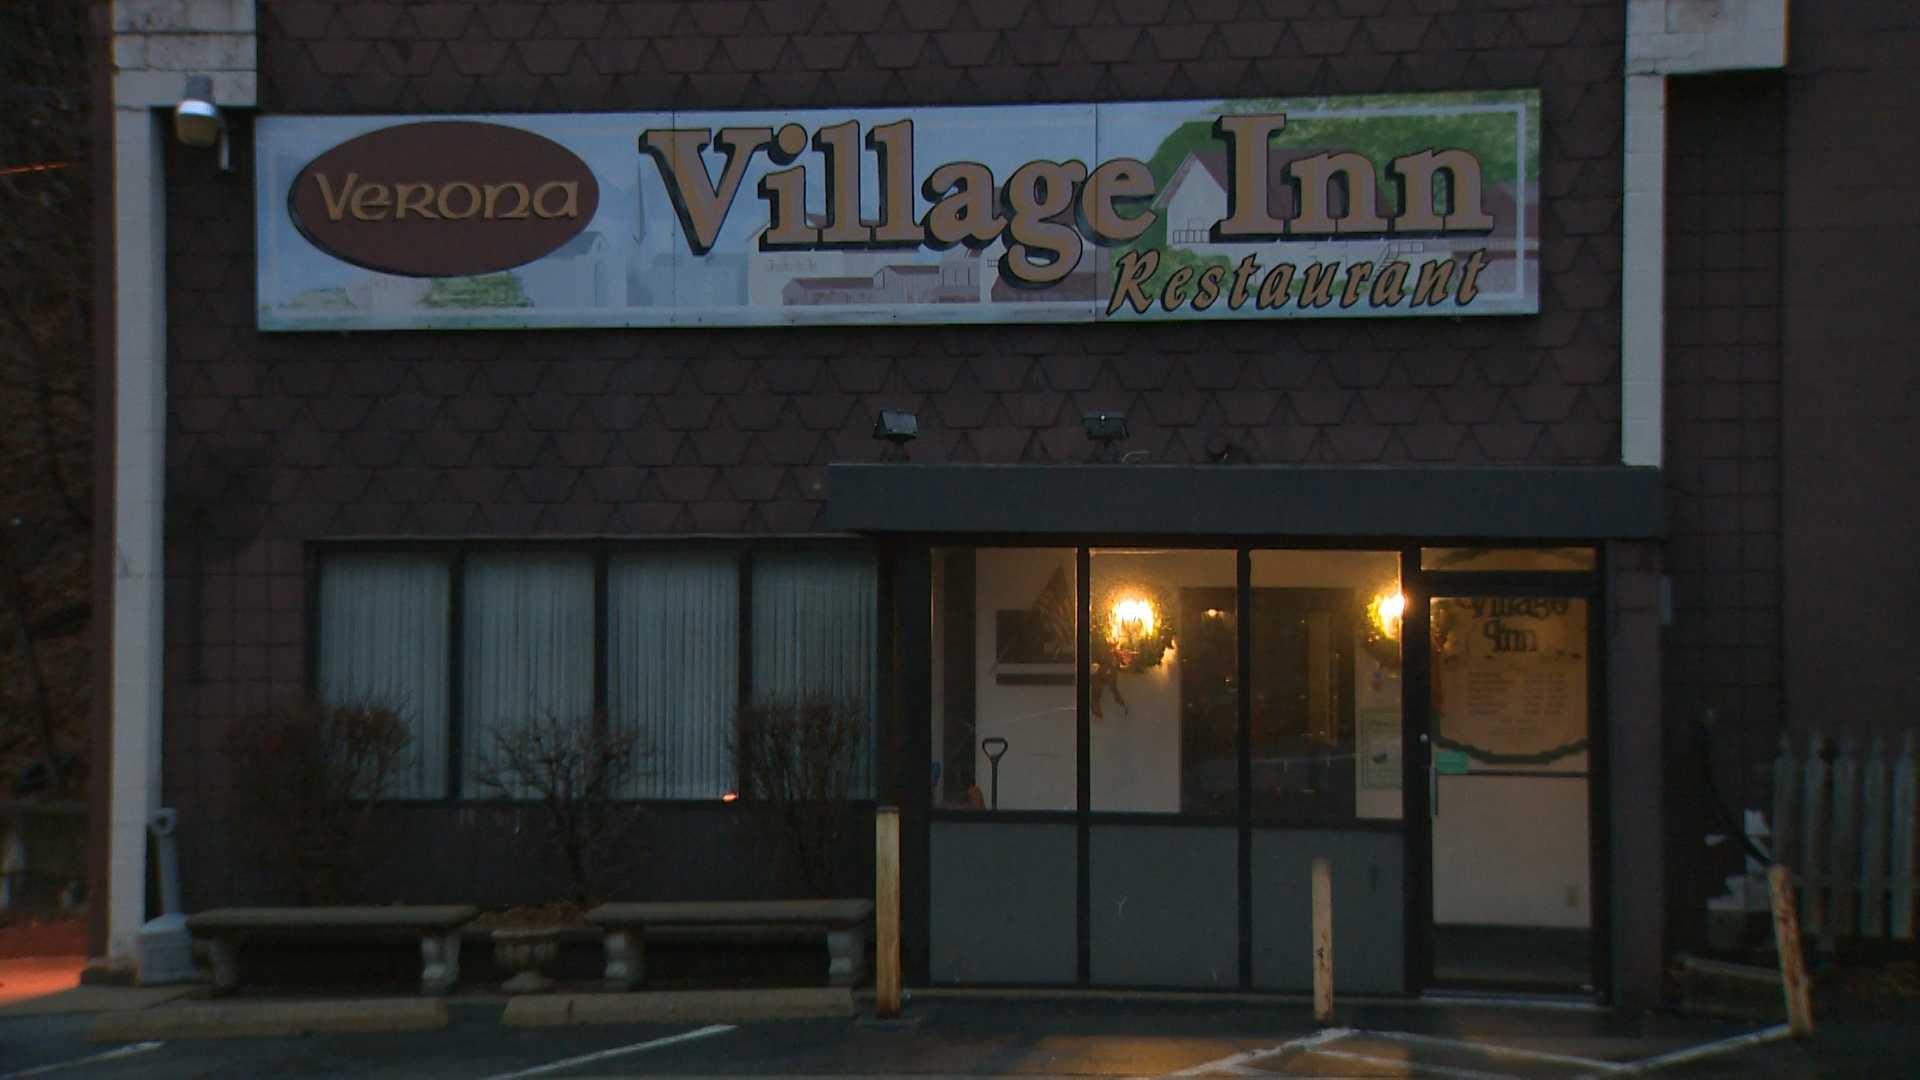 Verona Village Inn